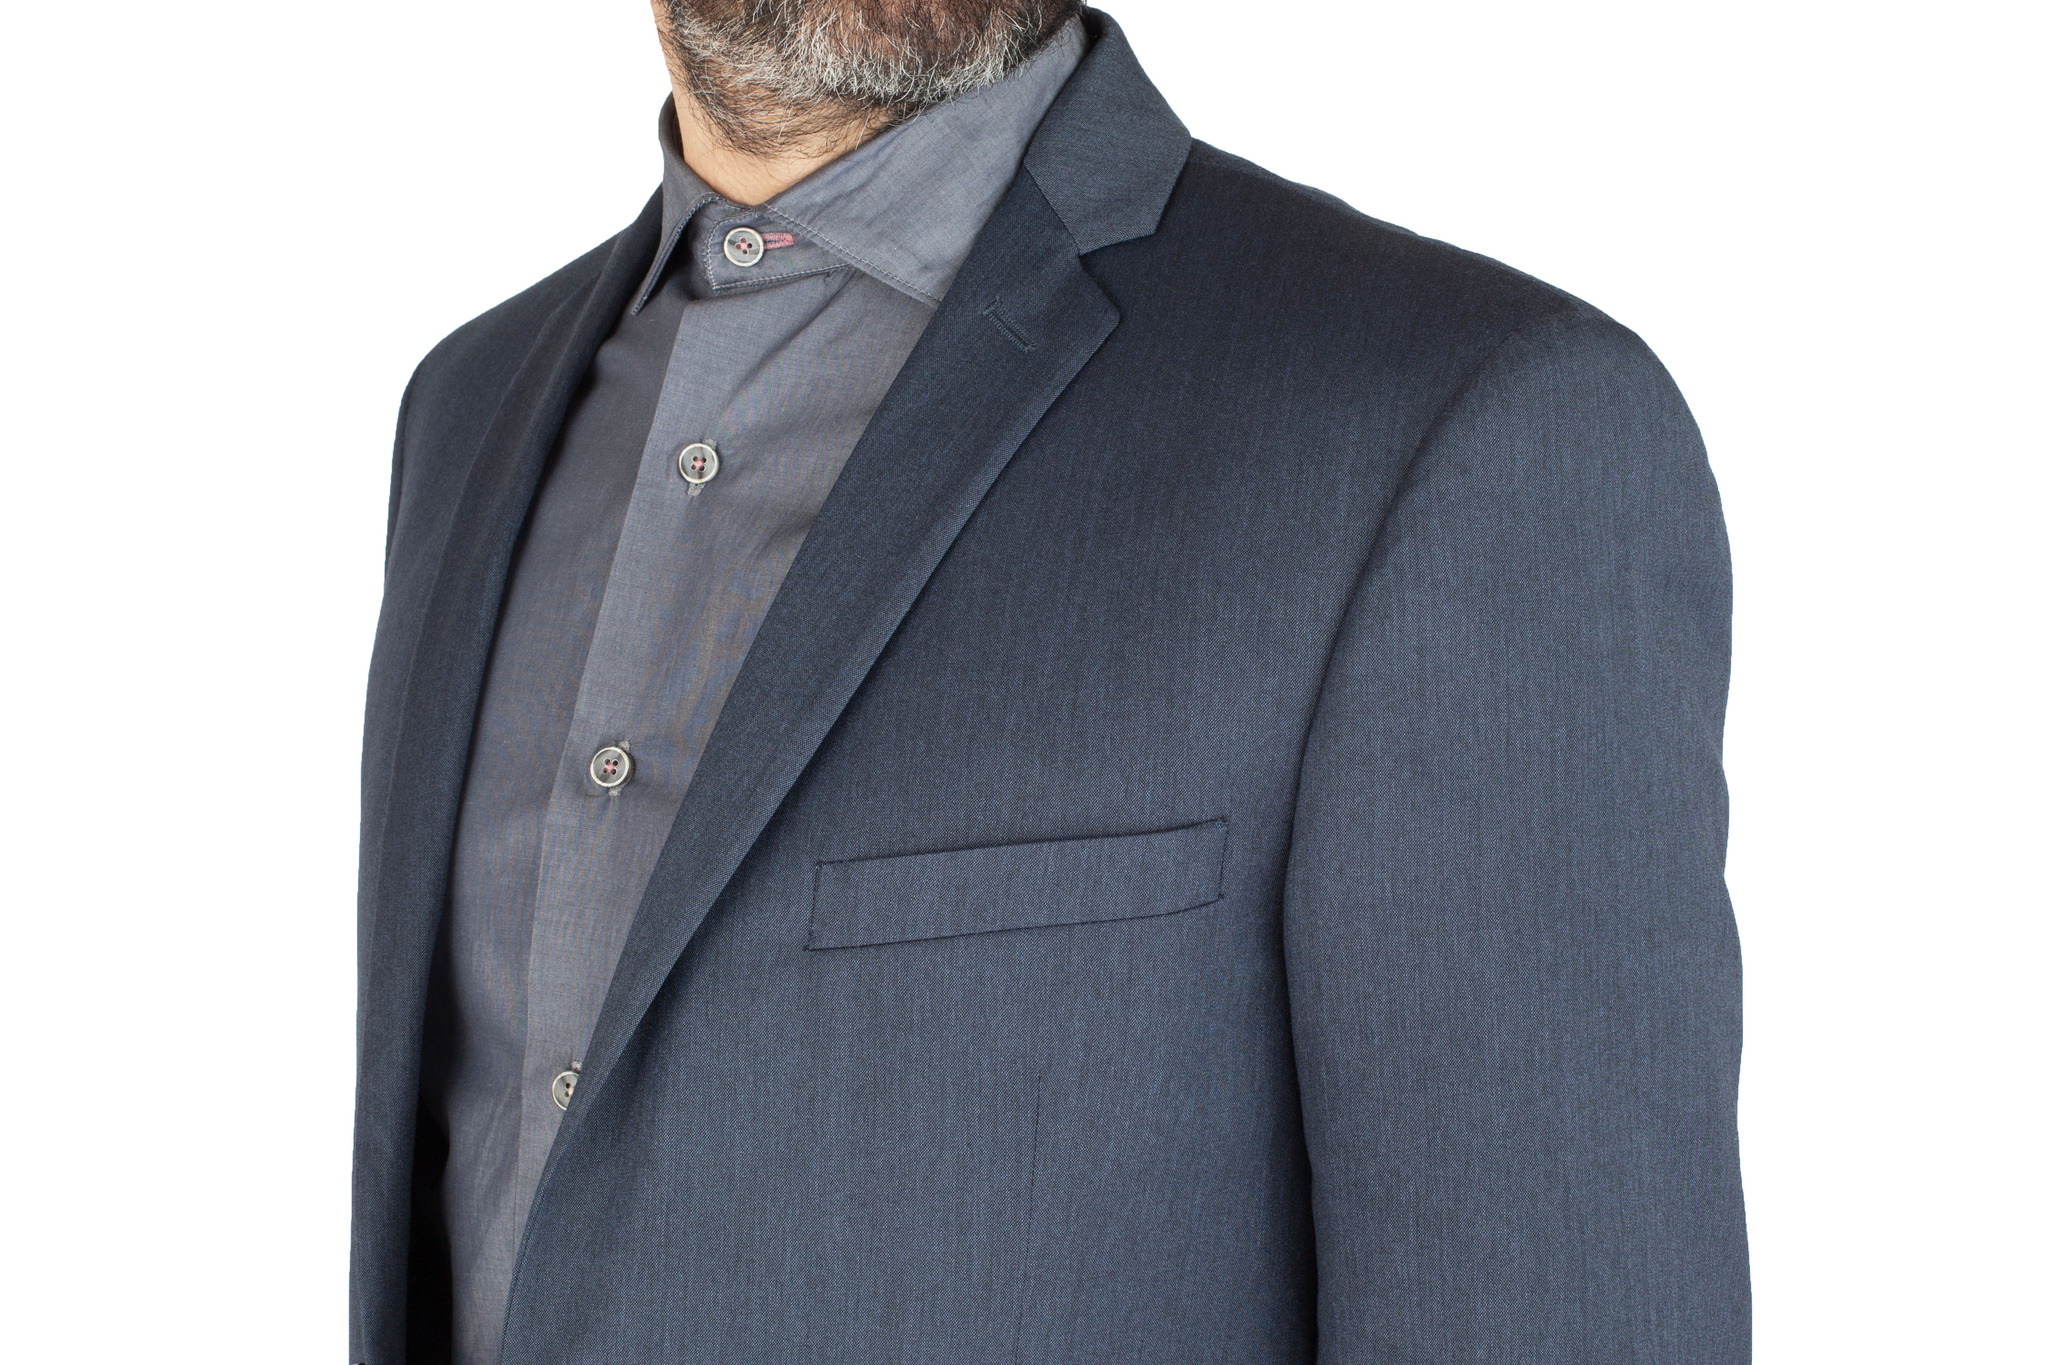 Синий шерстяной костюм, нагрудный карман